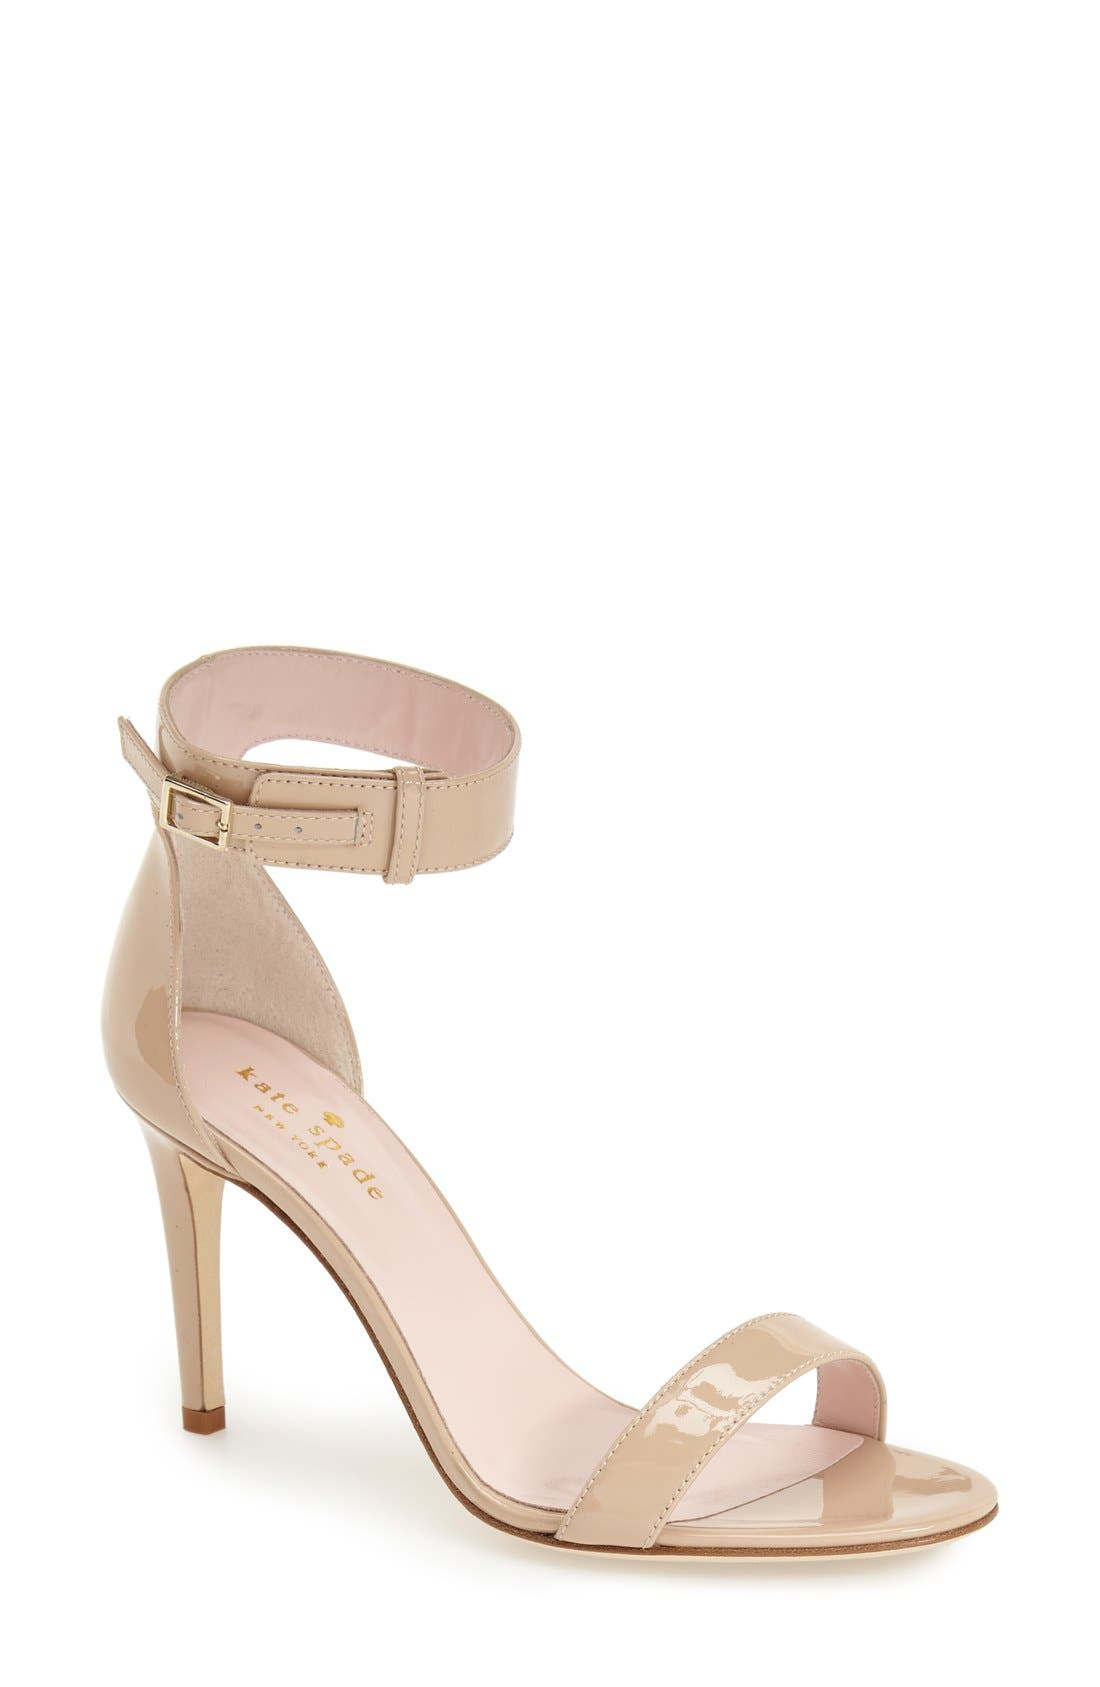 Main Image - kate spade new york 'isa' ankle strap sandal (Women)